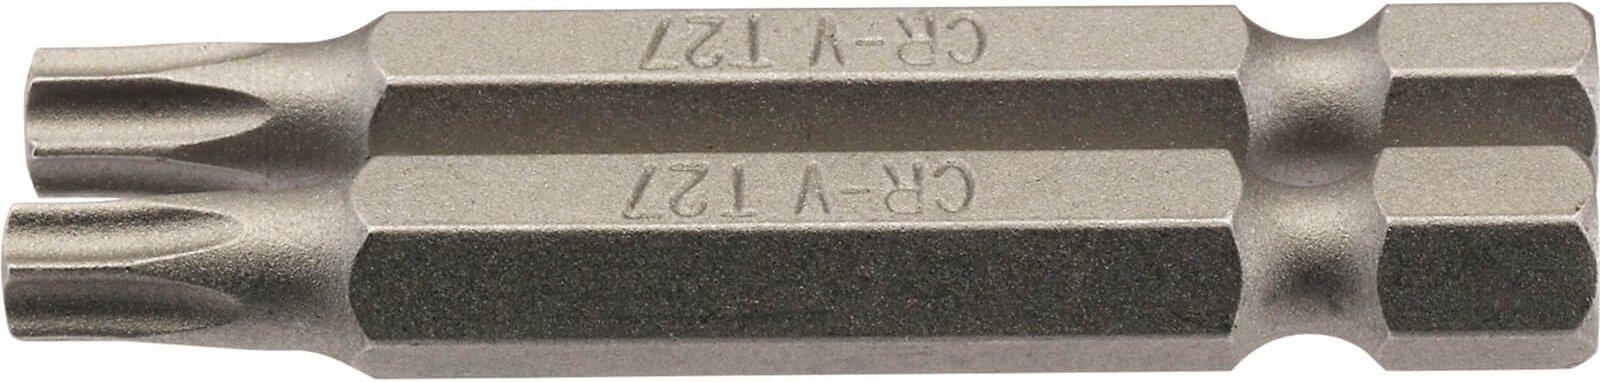 Draper Torx Screwdriver Bits T27 50mm Pack of 2